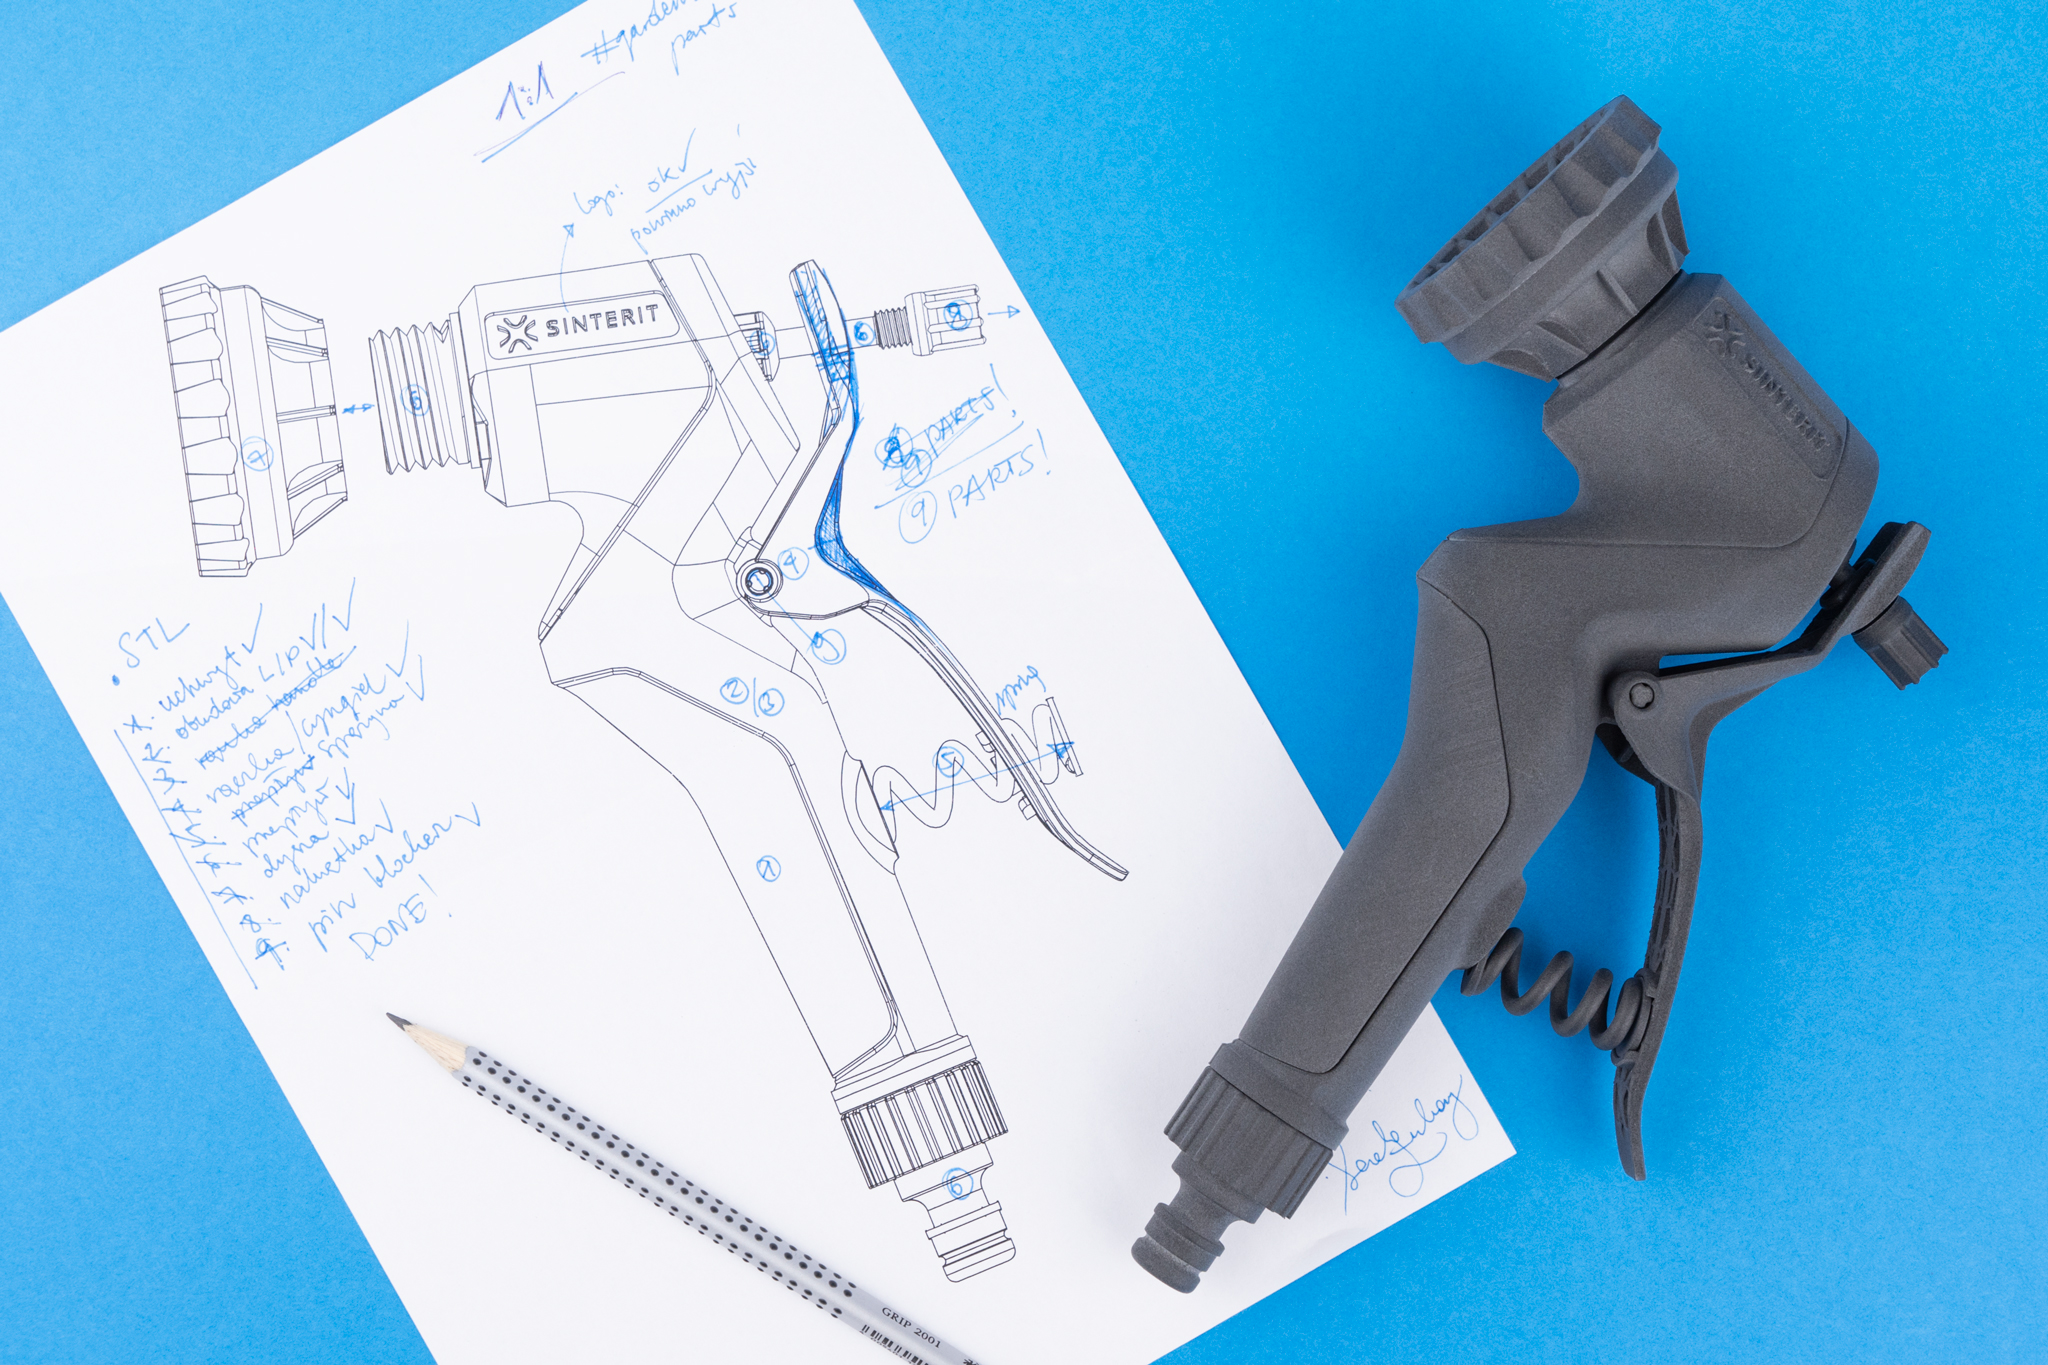 Garden hose nozzle prototype